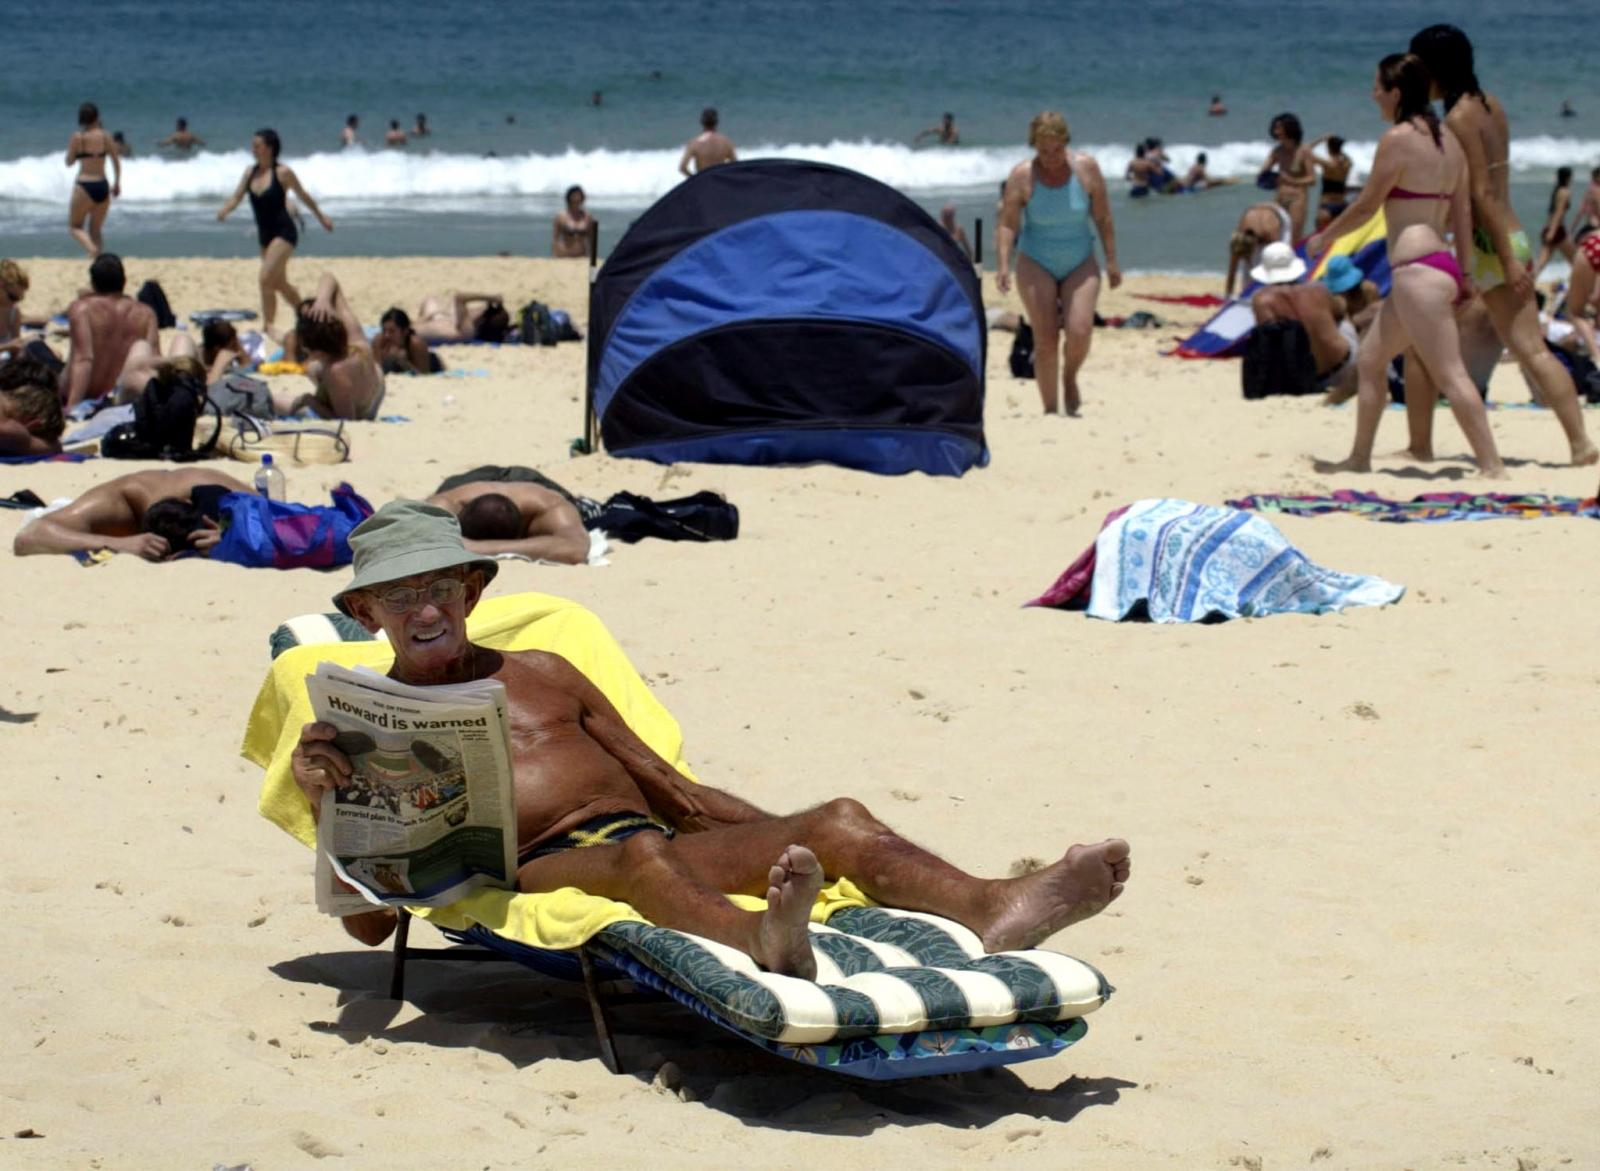 Elderly man sunbathing